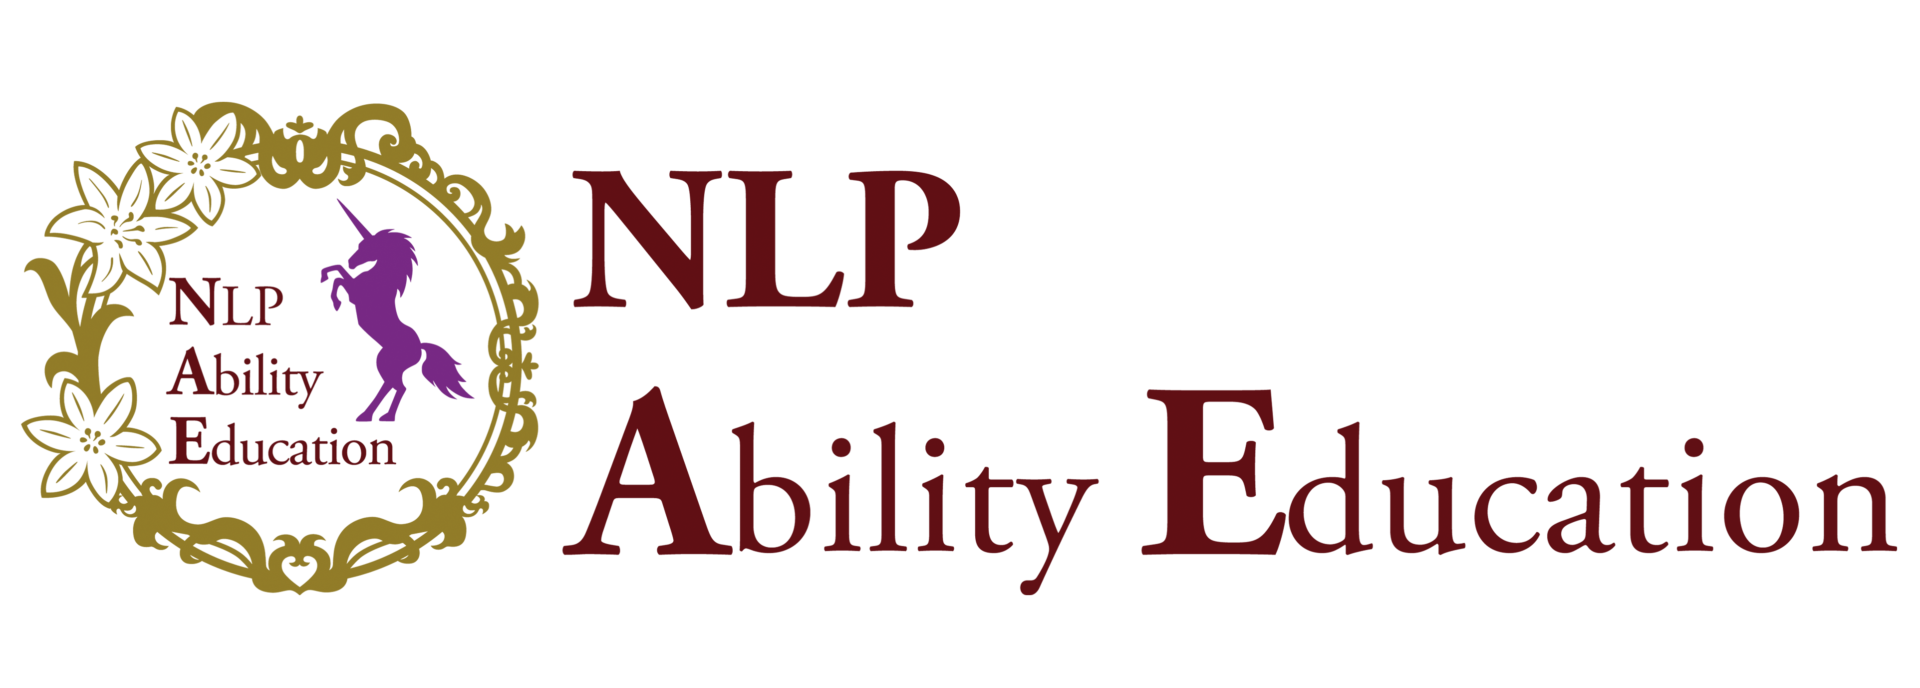 NLP Ability Education-NLP アビリティ エデュケーション-